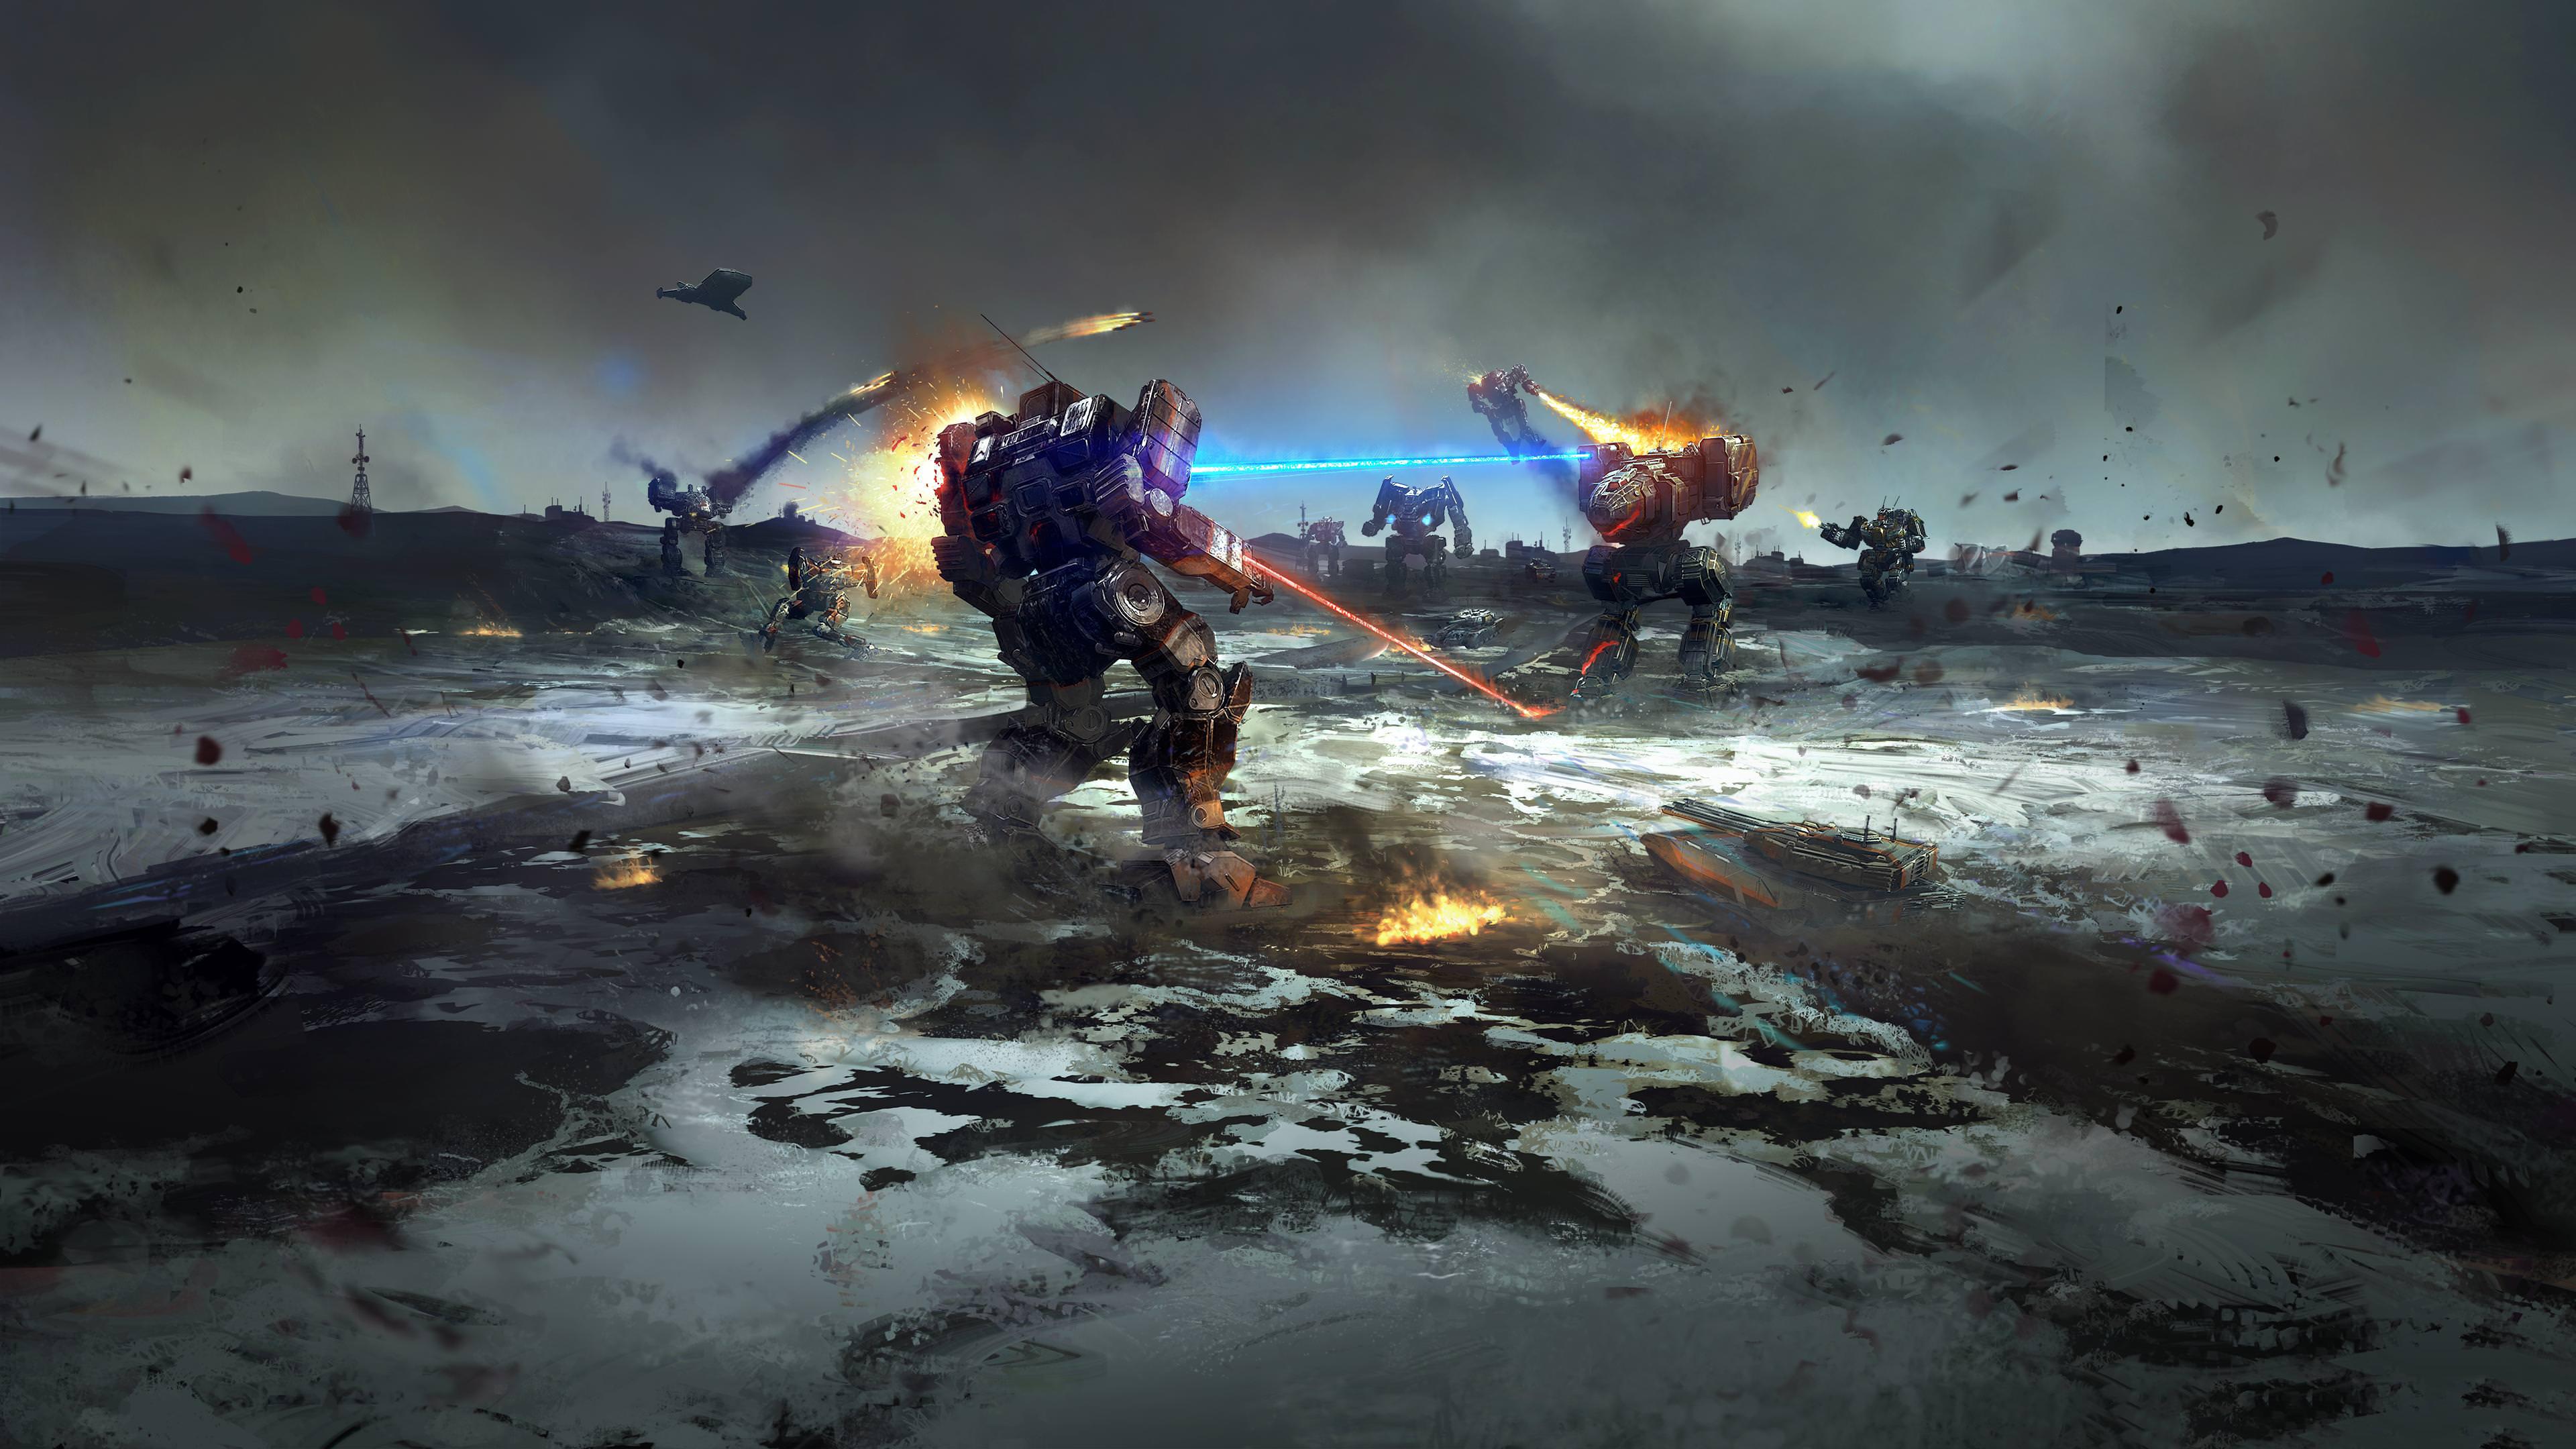 Battletech Game 2019, HD Games, 4k